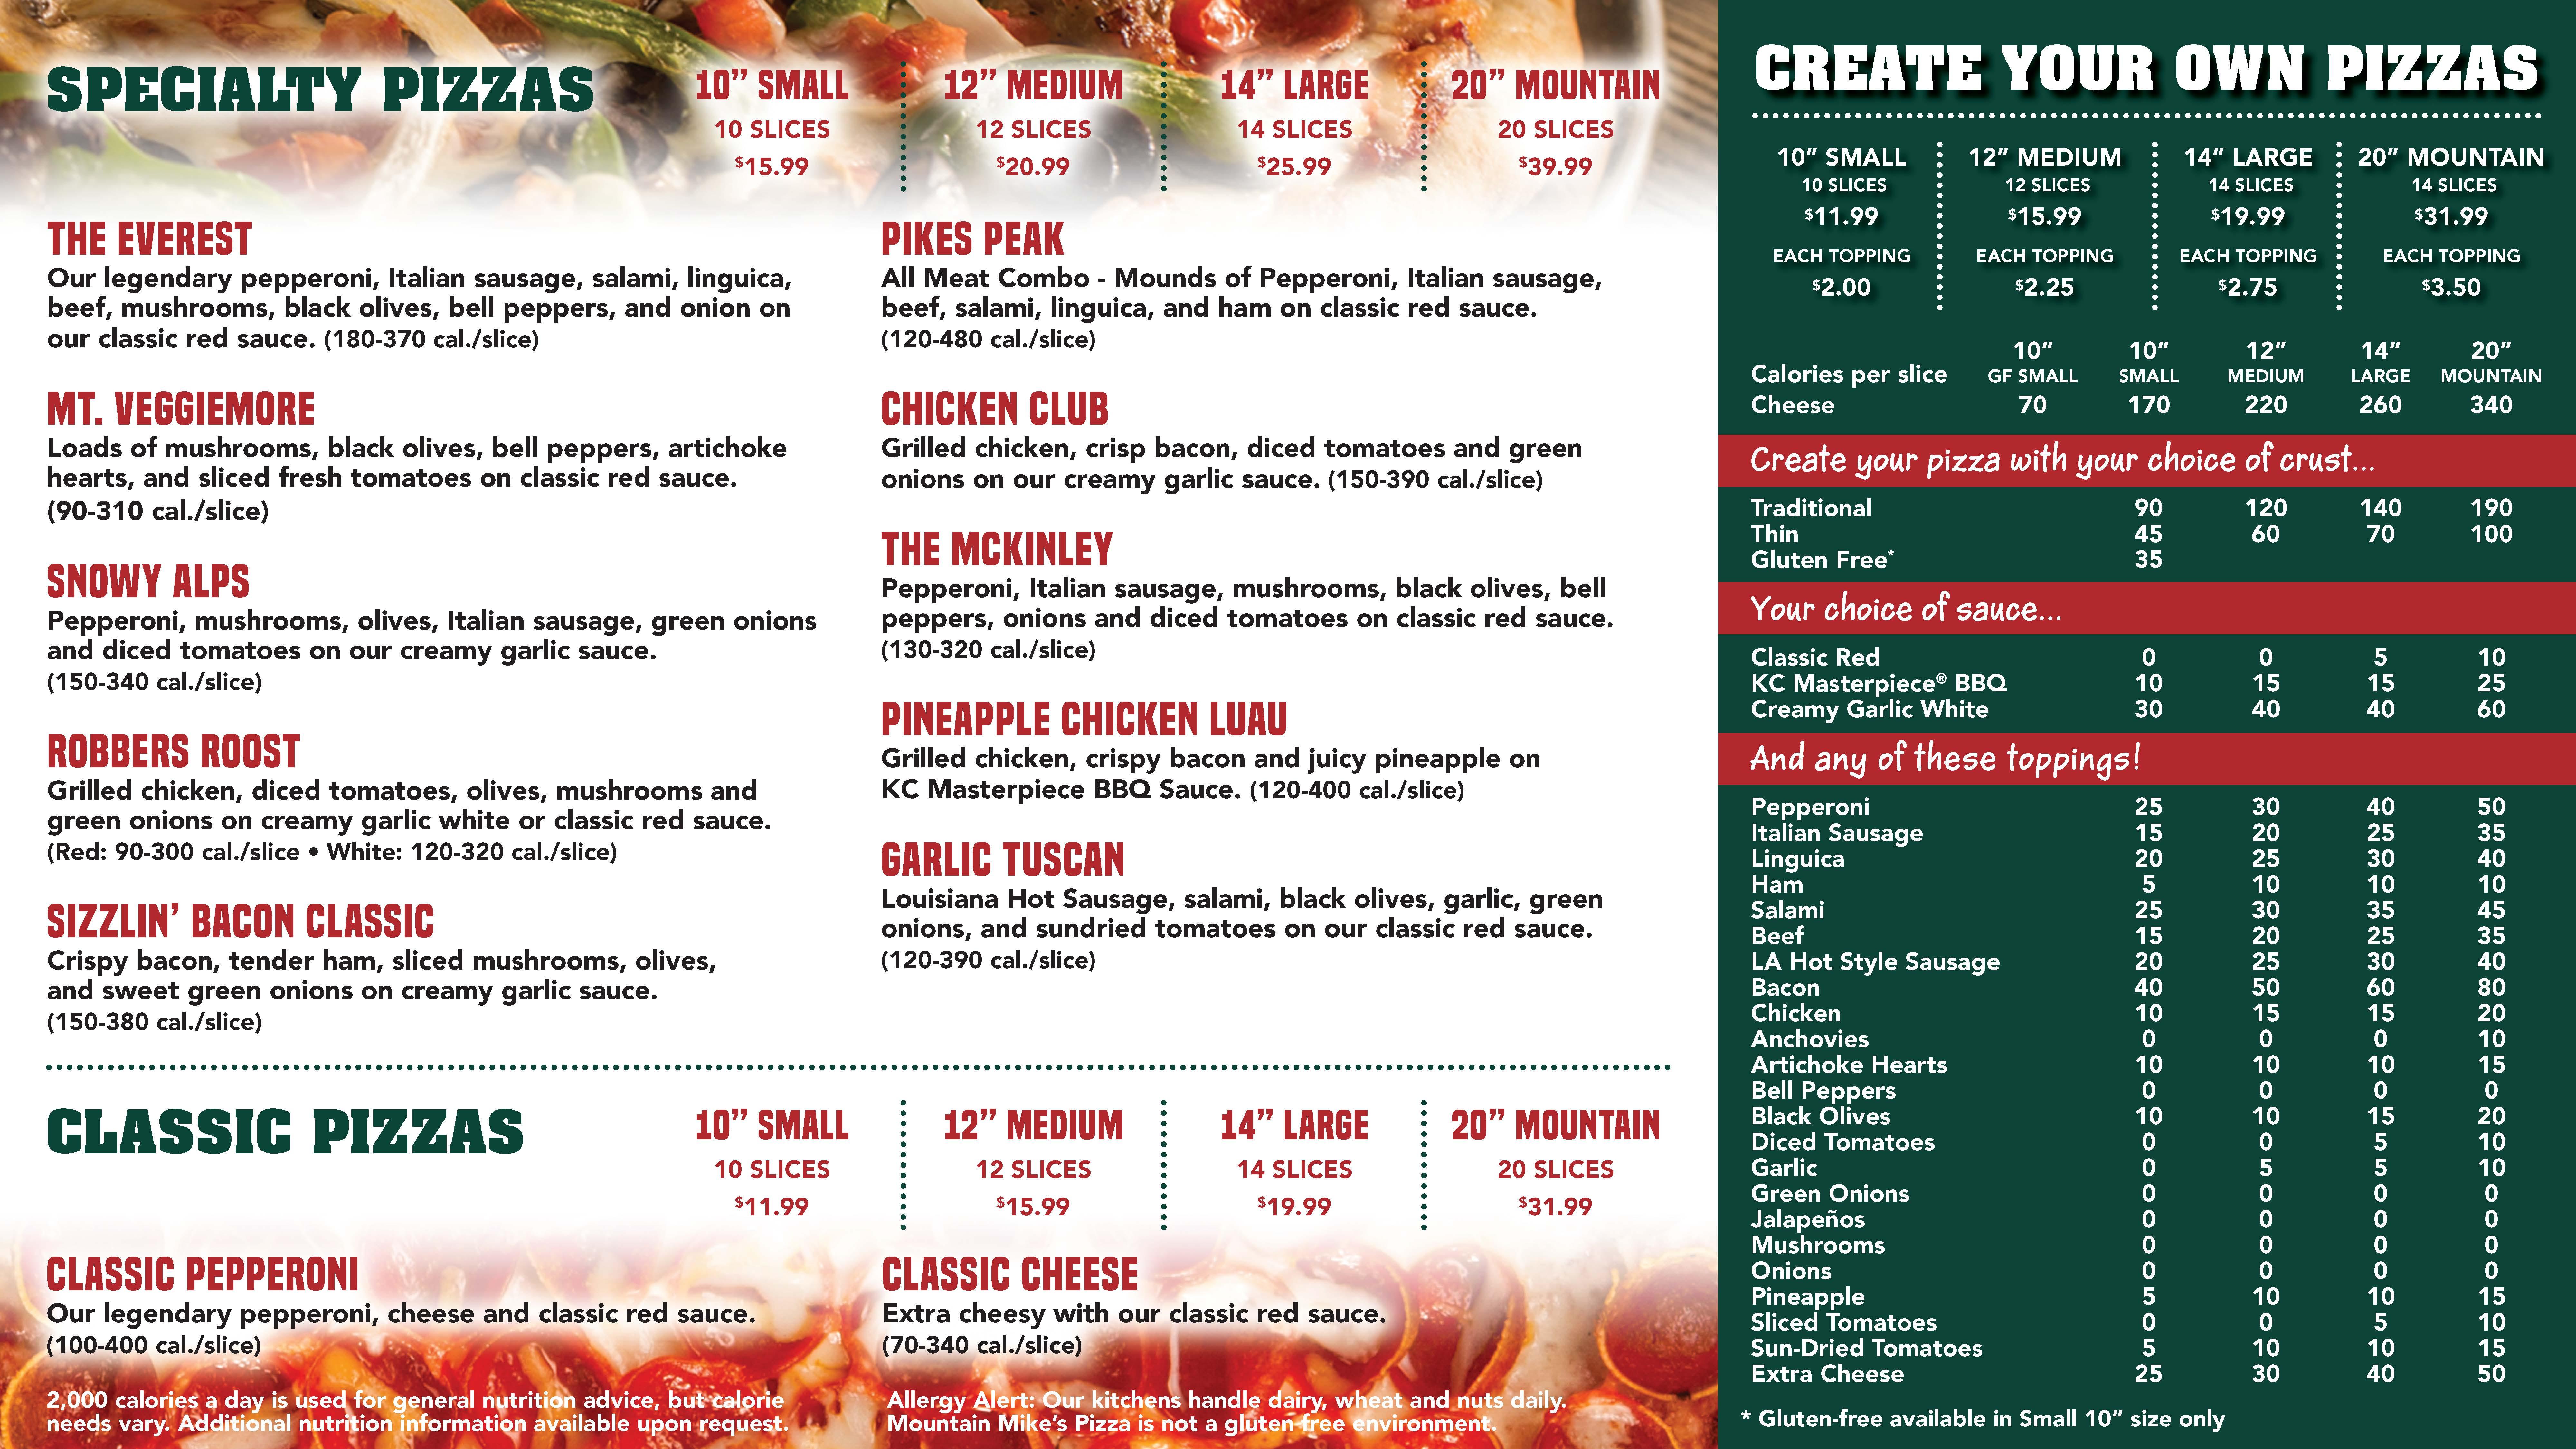 Image of a pizza menu.